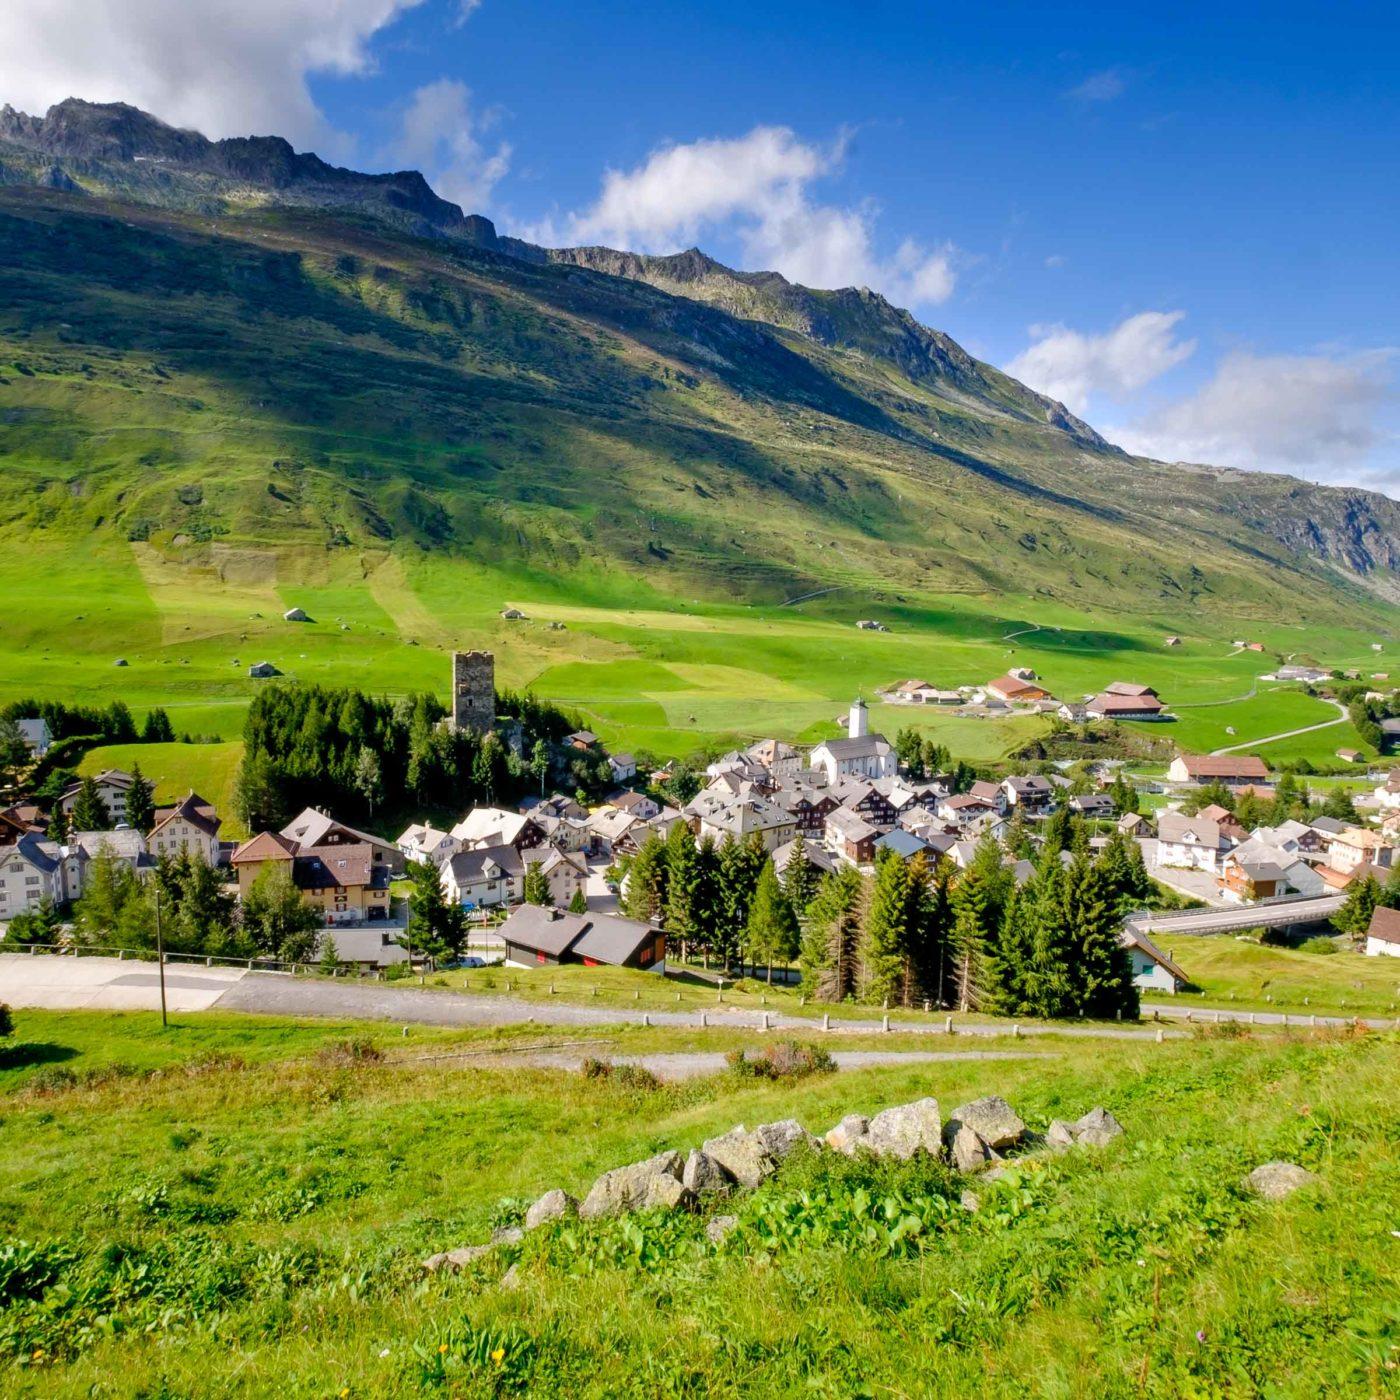 Hospental, Switzerland